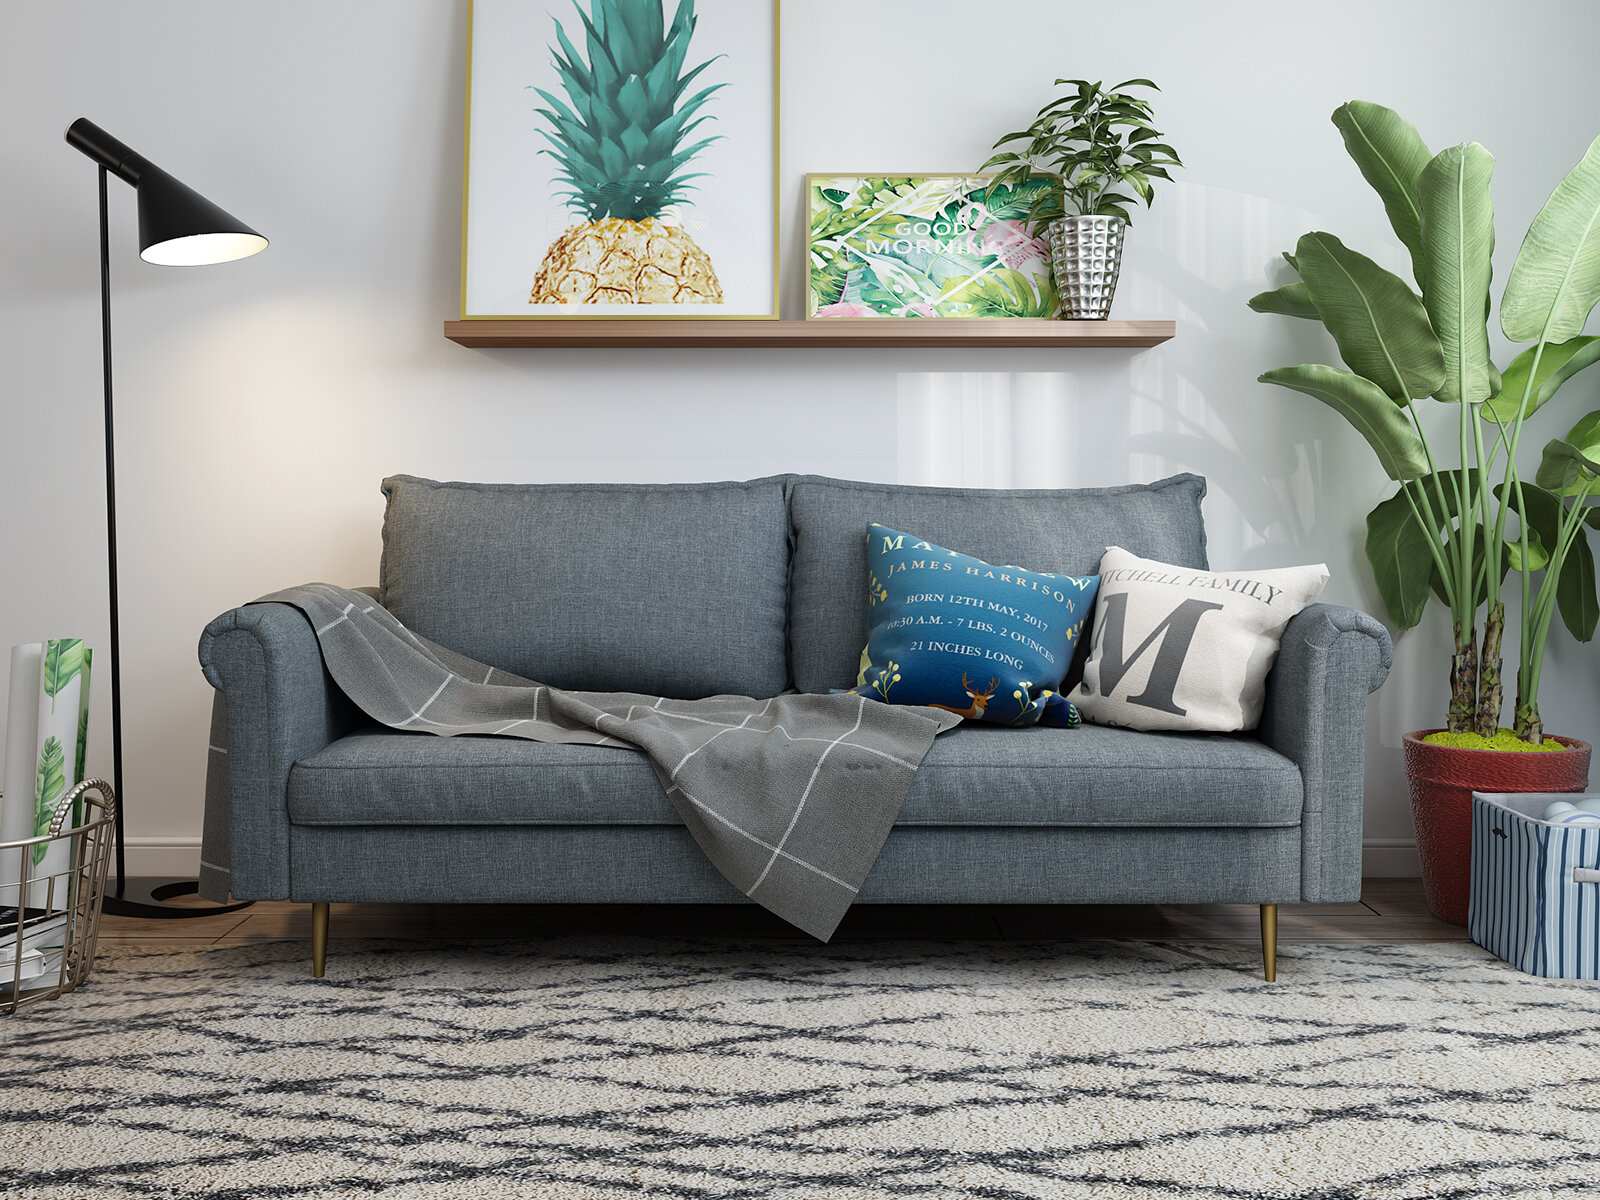 sofa-1 +110 Unique Living Room Furniture Pieces That Amaze Everyone